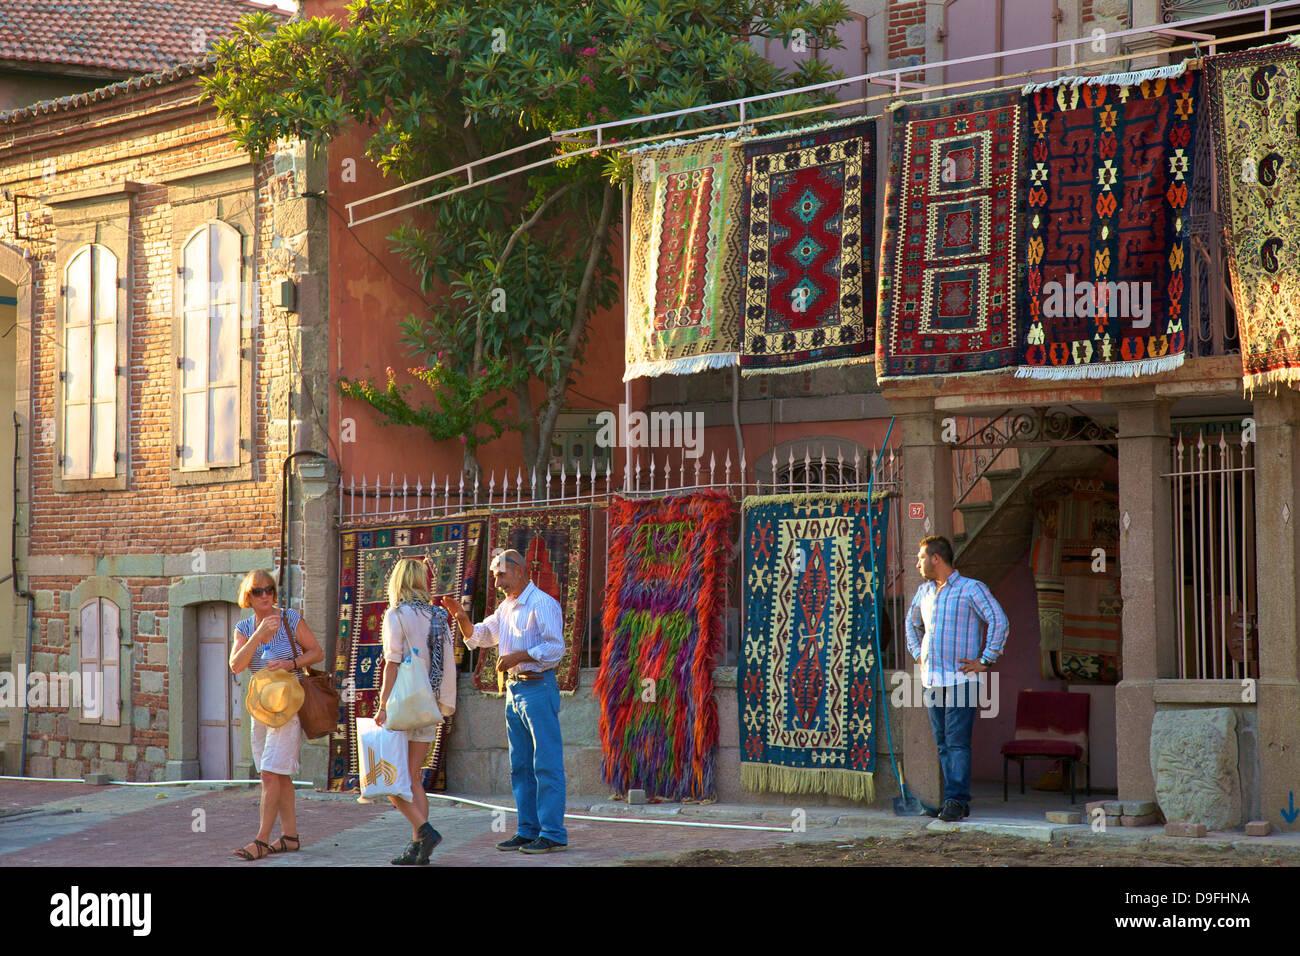 Carpet shop with tourists, Pergamum, Anatolia, Turkey Minor, Eurasia - Stock Image